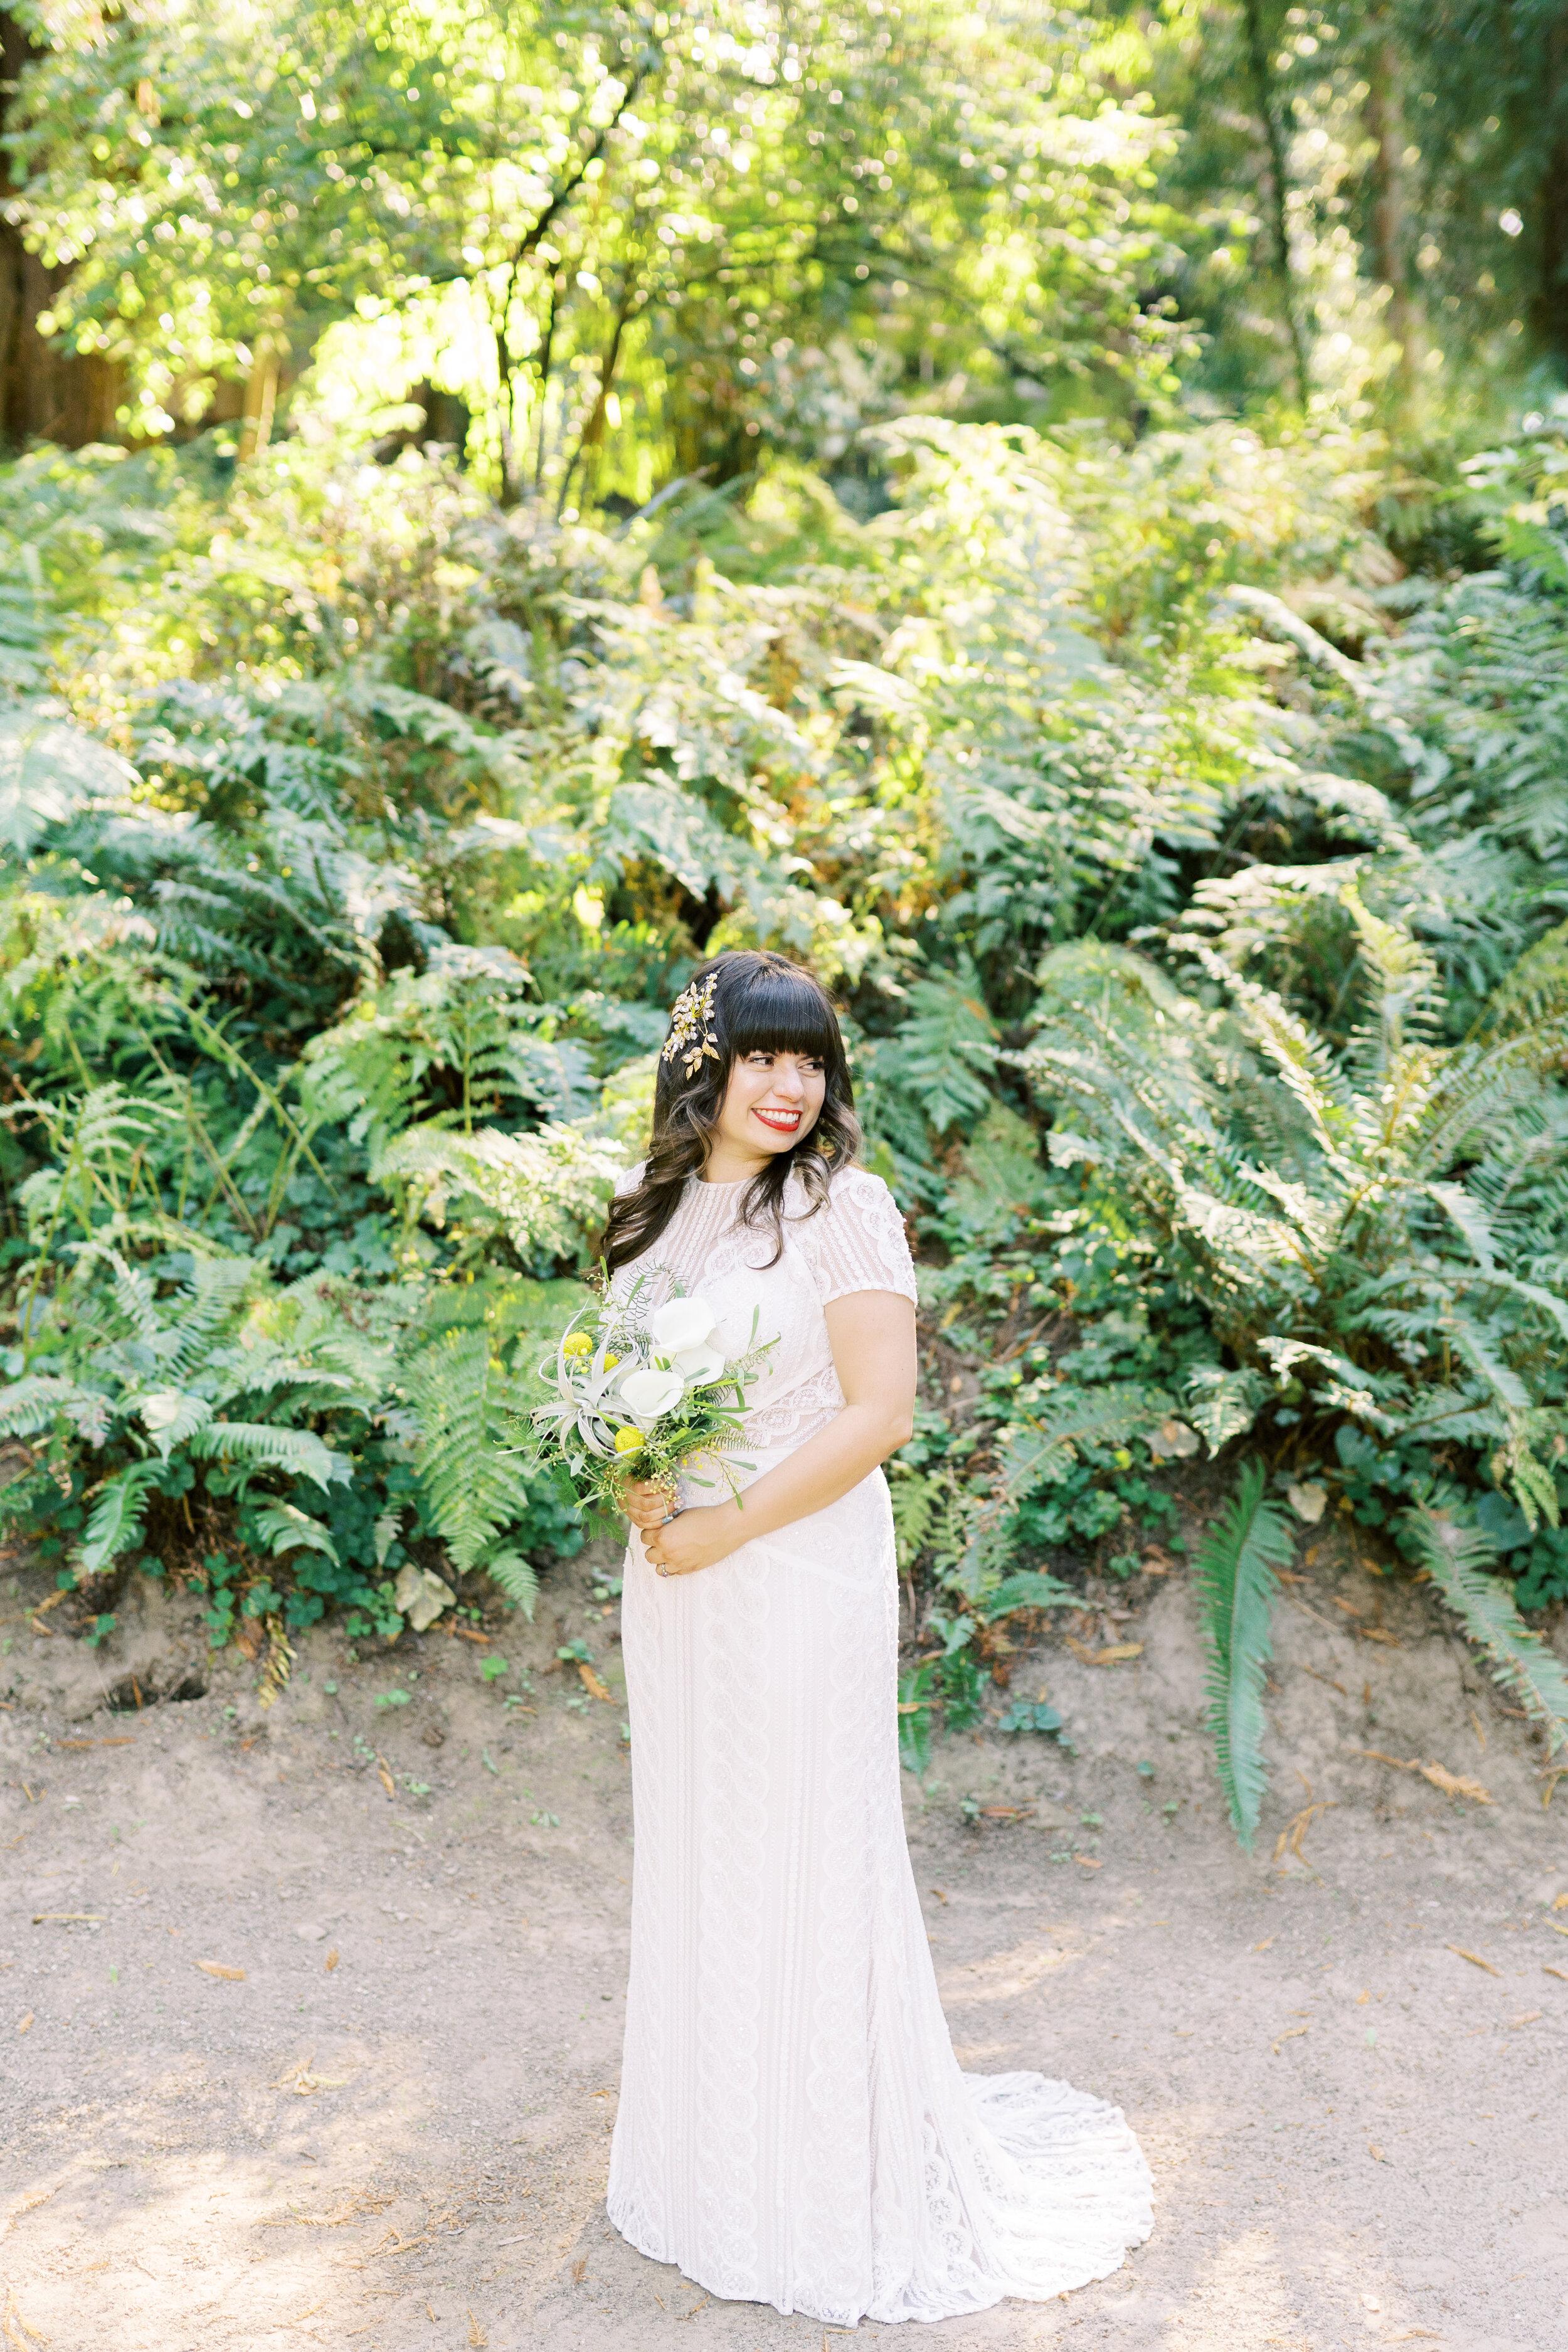 CorinnaRosePhotography-47.jpg